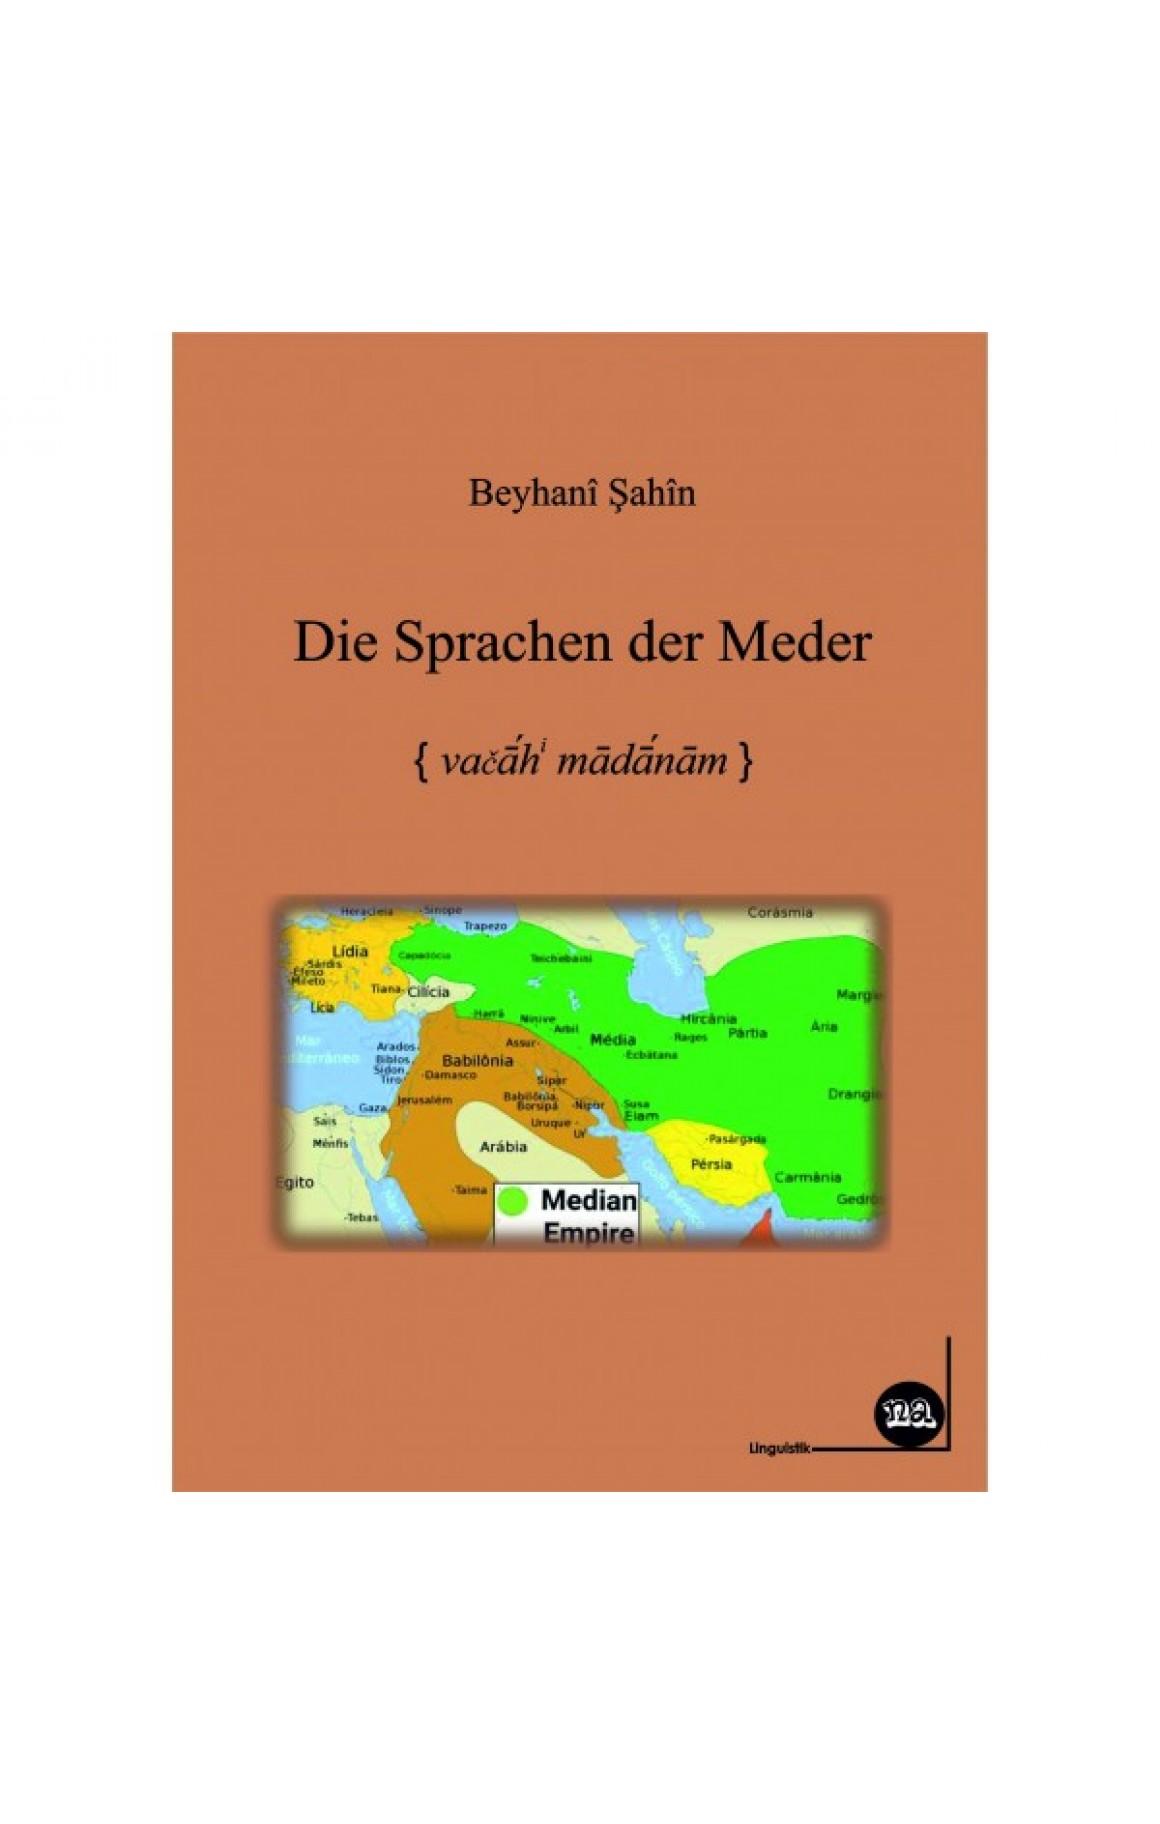 Die Sprachen Der Med - VaÓcā́hi Mādā́nām